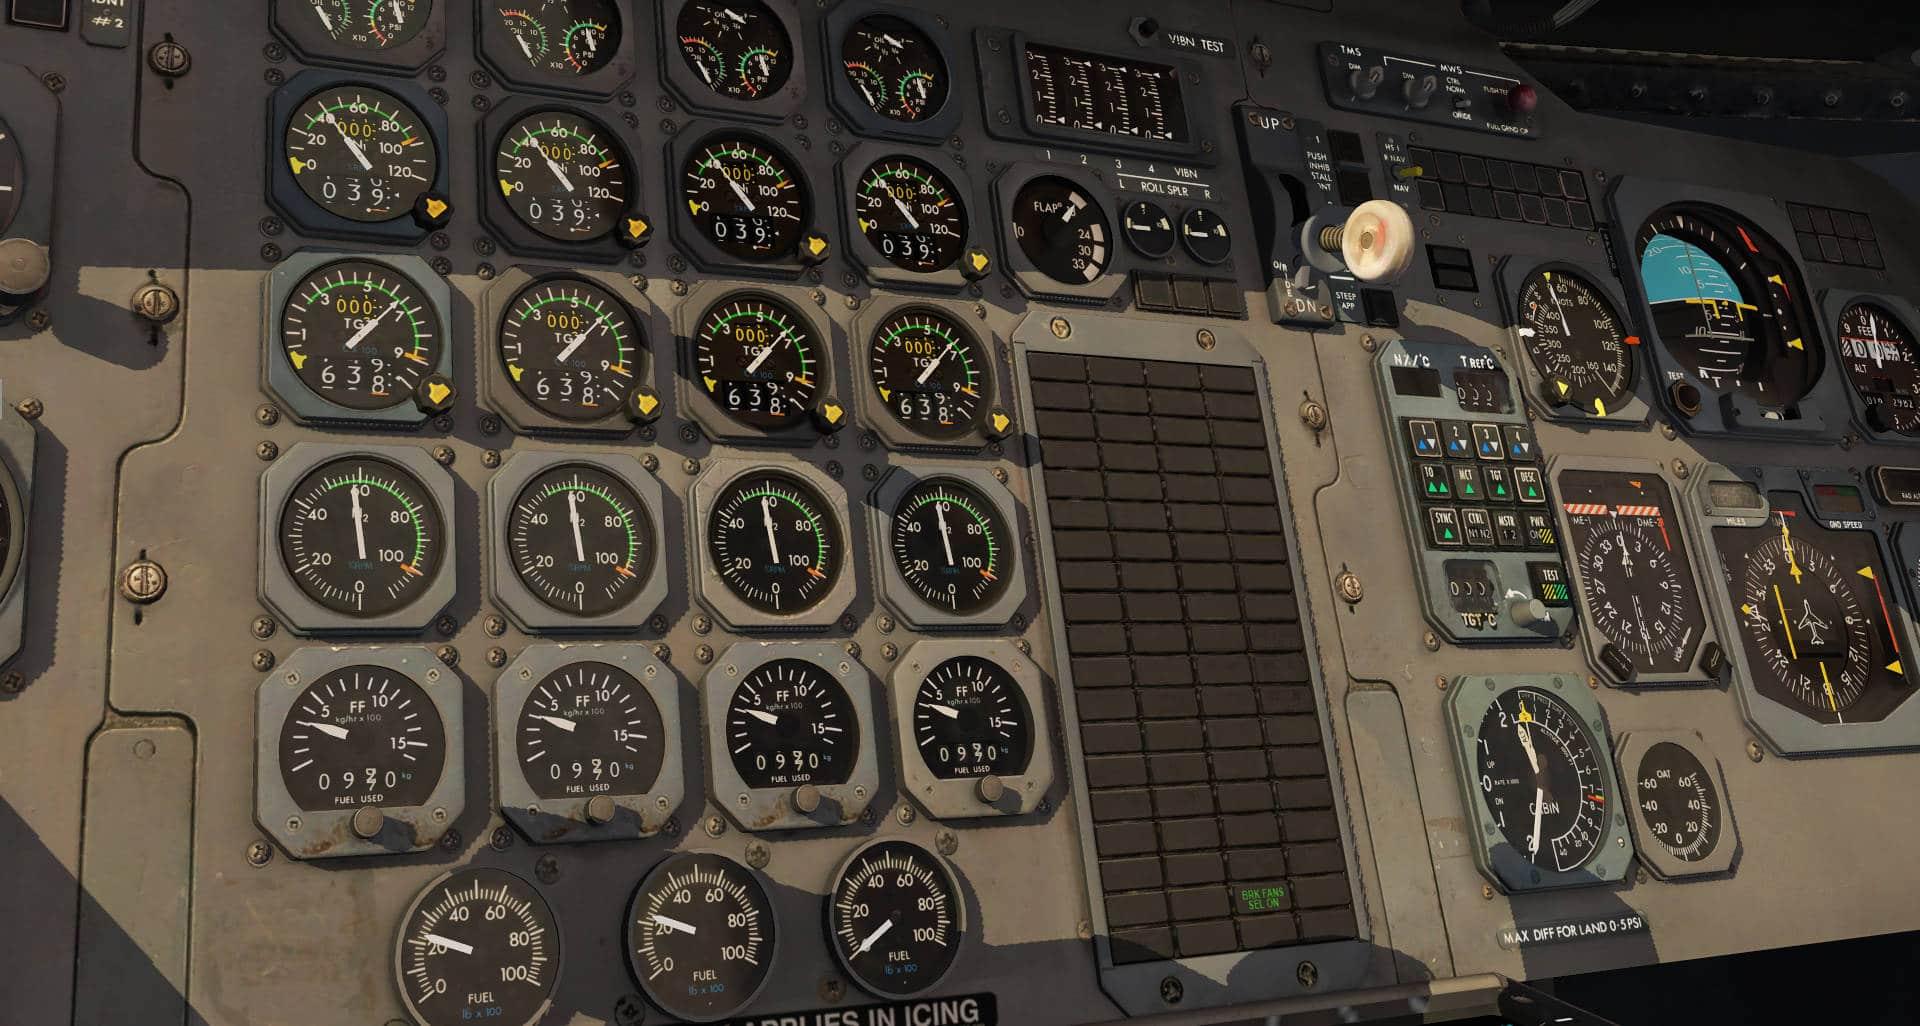 146-professional-xplane_52_ss_l_210105151814